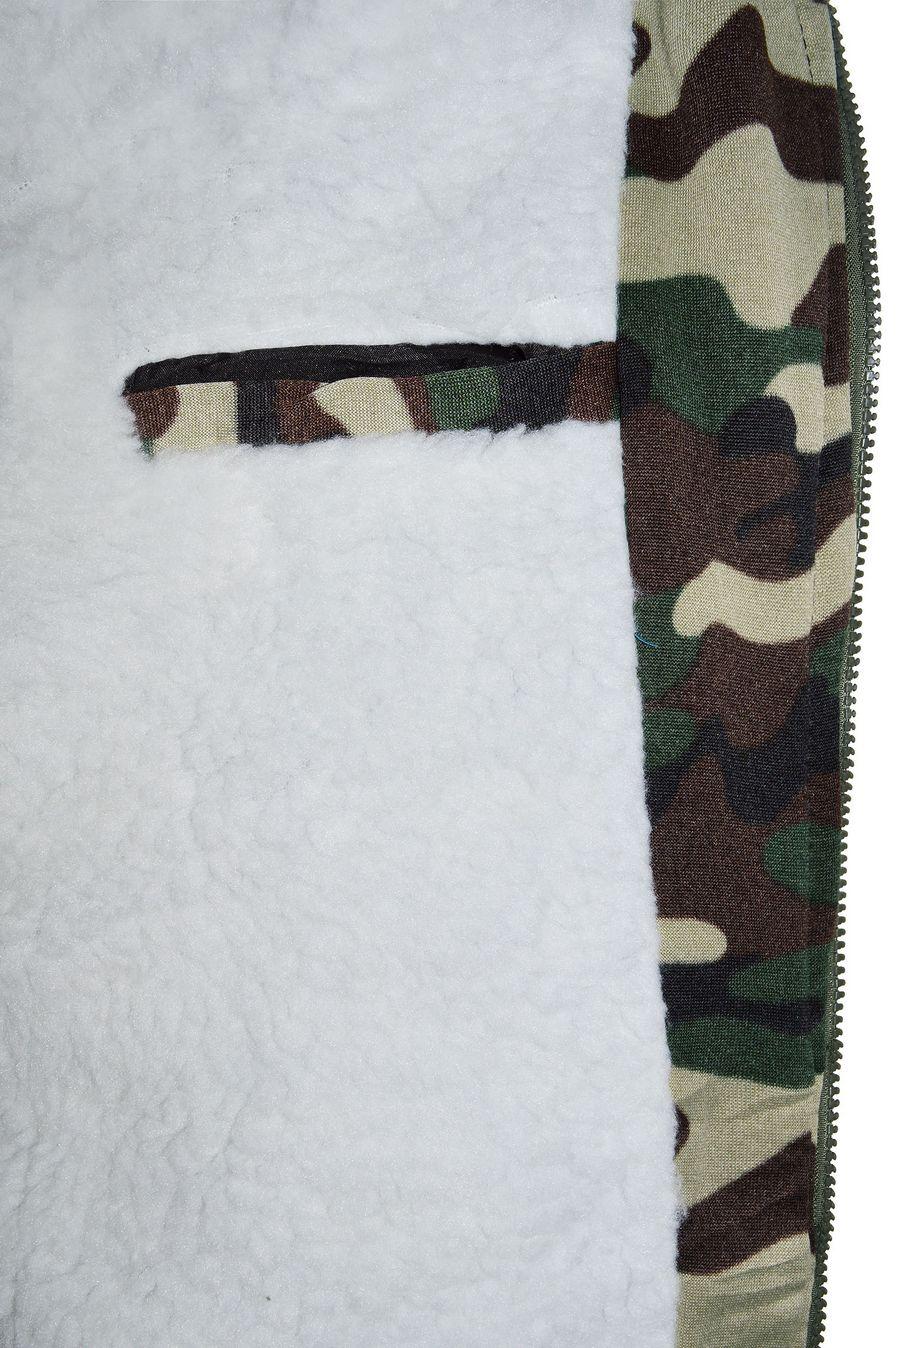 Куртка мужская Rosser 01 светлая камуфляж утепленная - фото 3